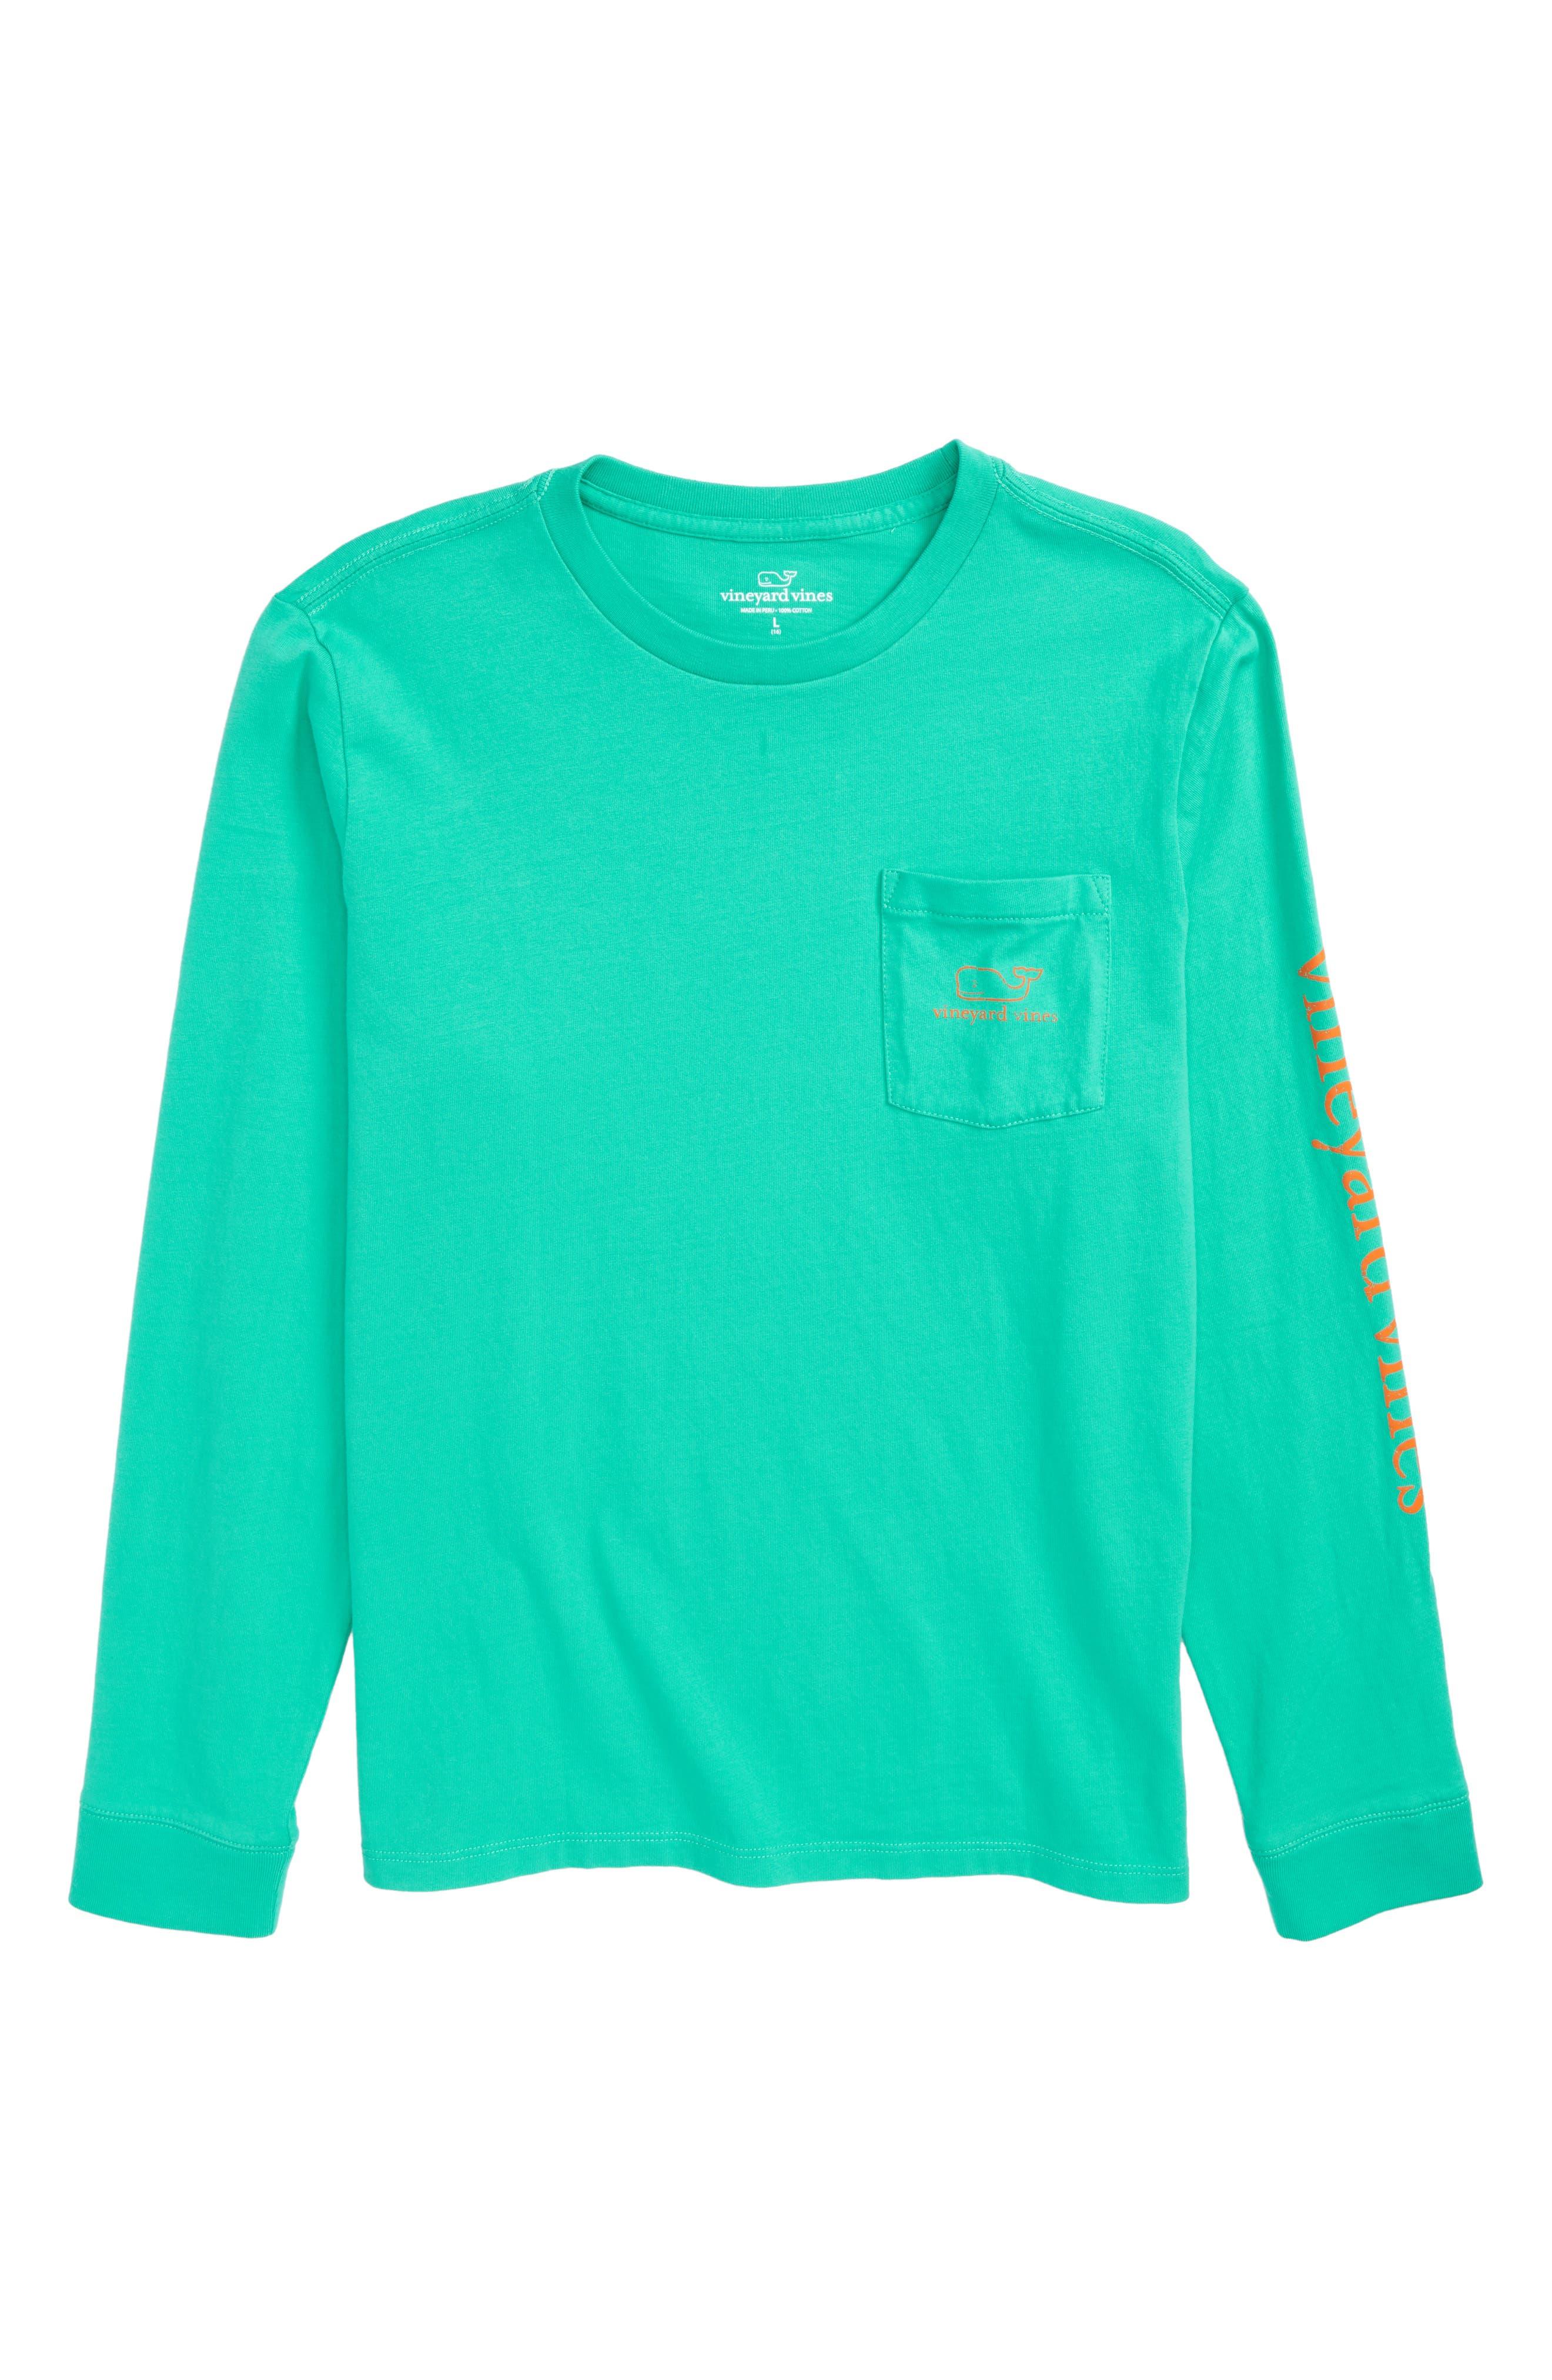 Vintage Whale Graphic Long Sleeve T-Shirt,                             Main thumbnail 1, color,                             Caribbean Green